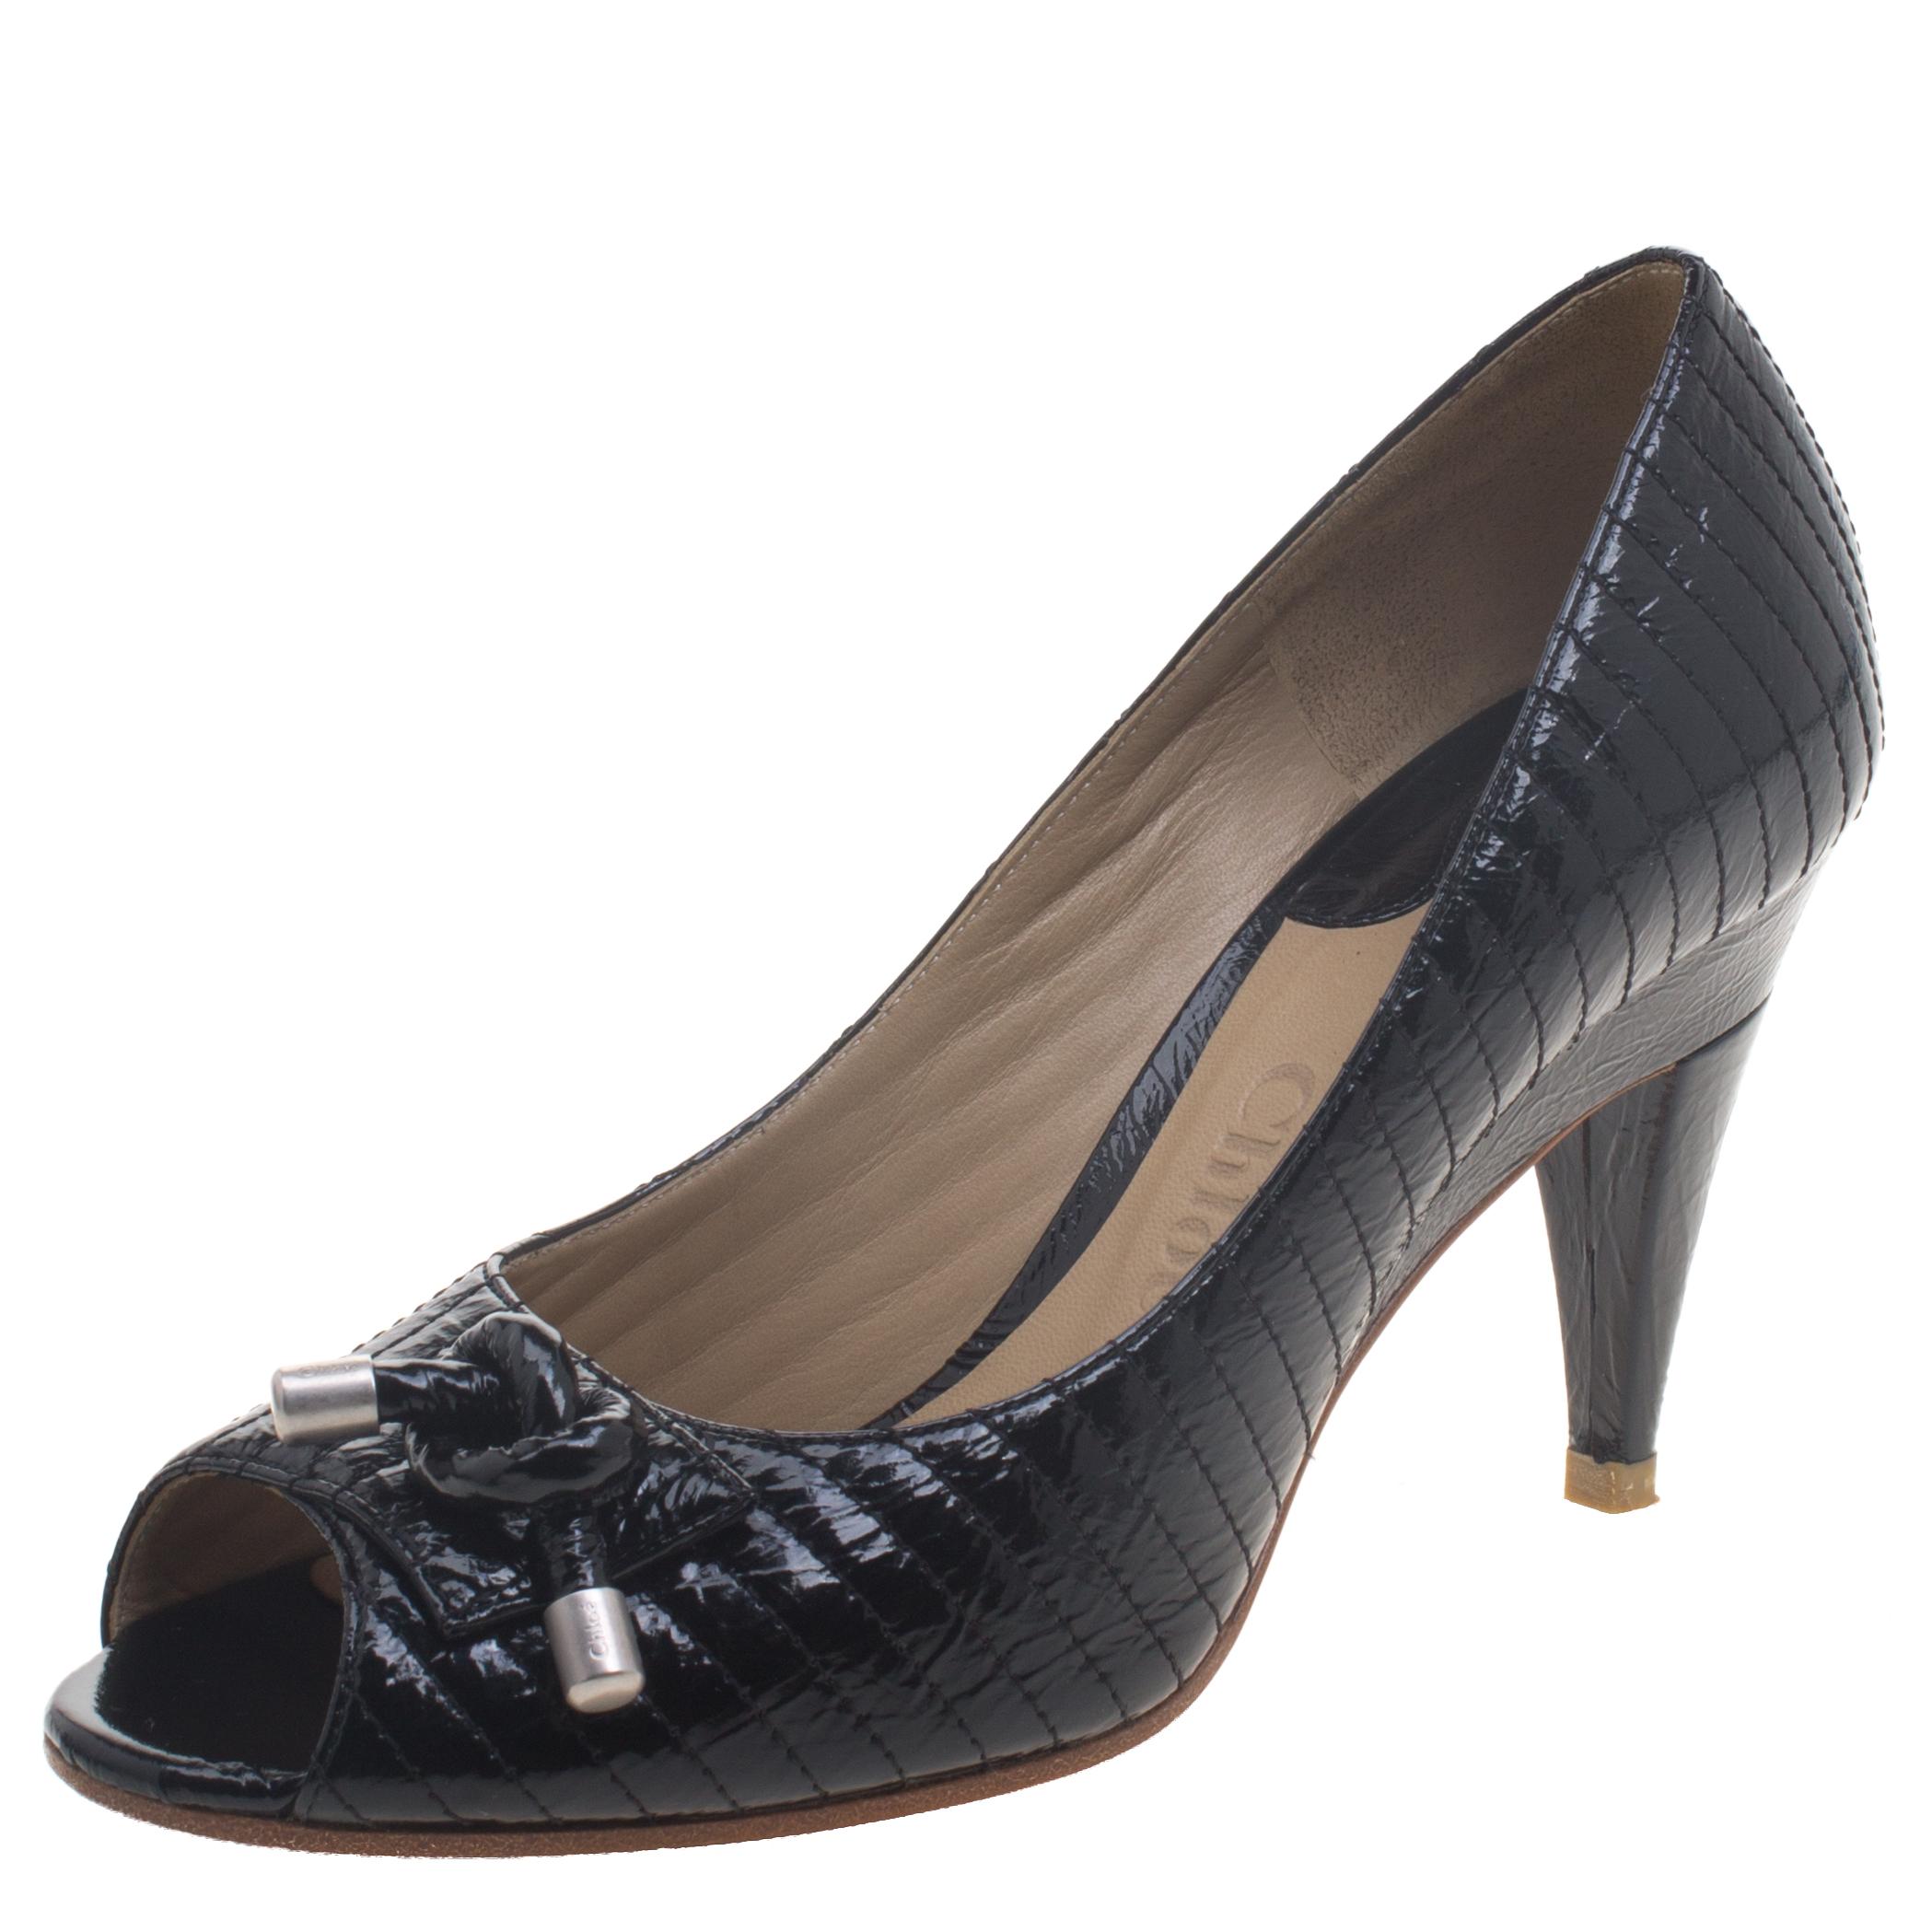 9122aaa6b4f Buy Chloe Black Patent Leather Line Stitch Detail Peep Toe Pumps ...